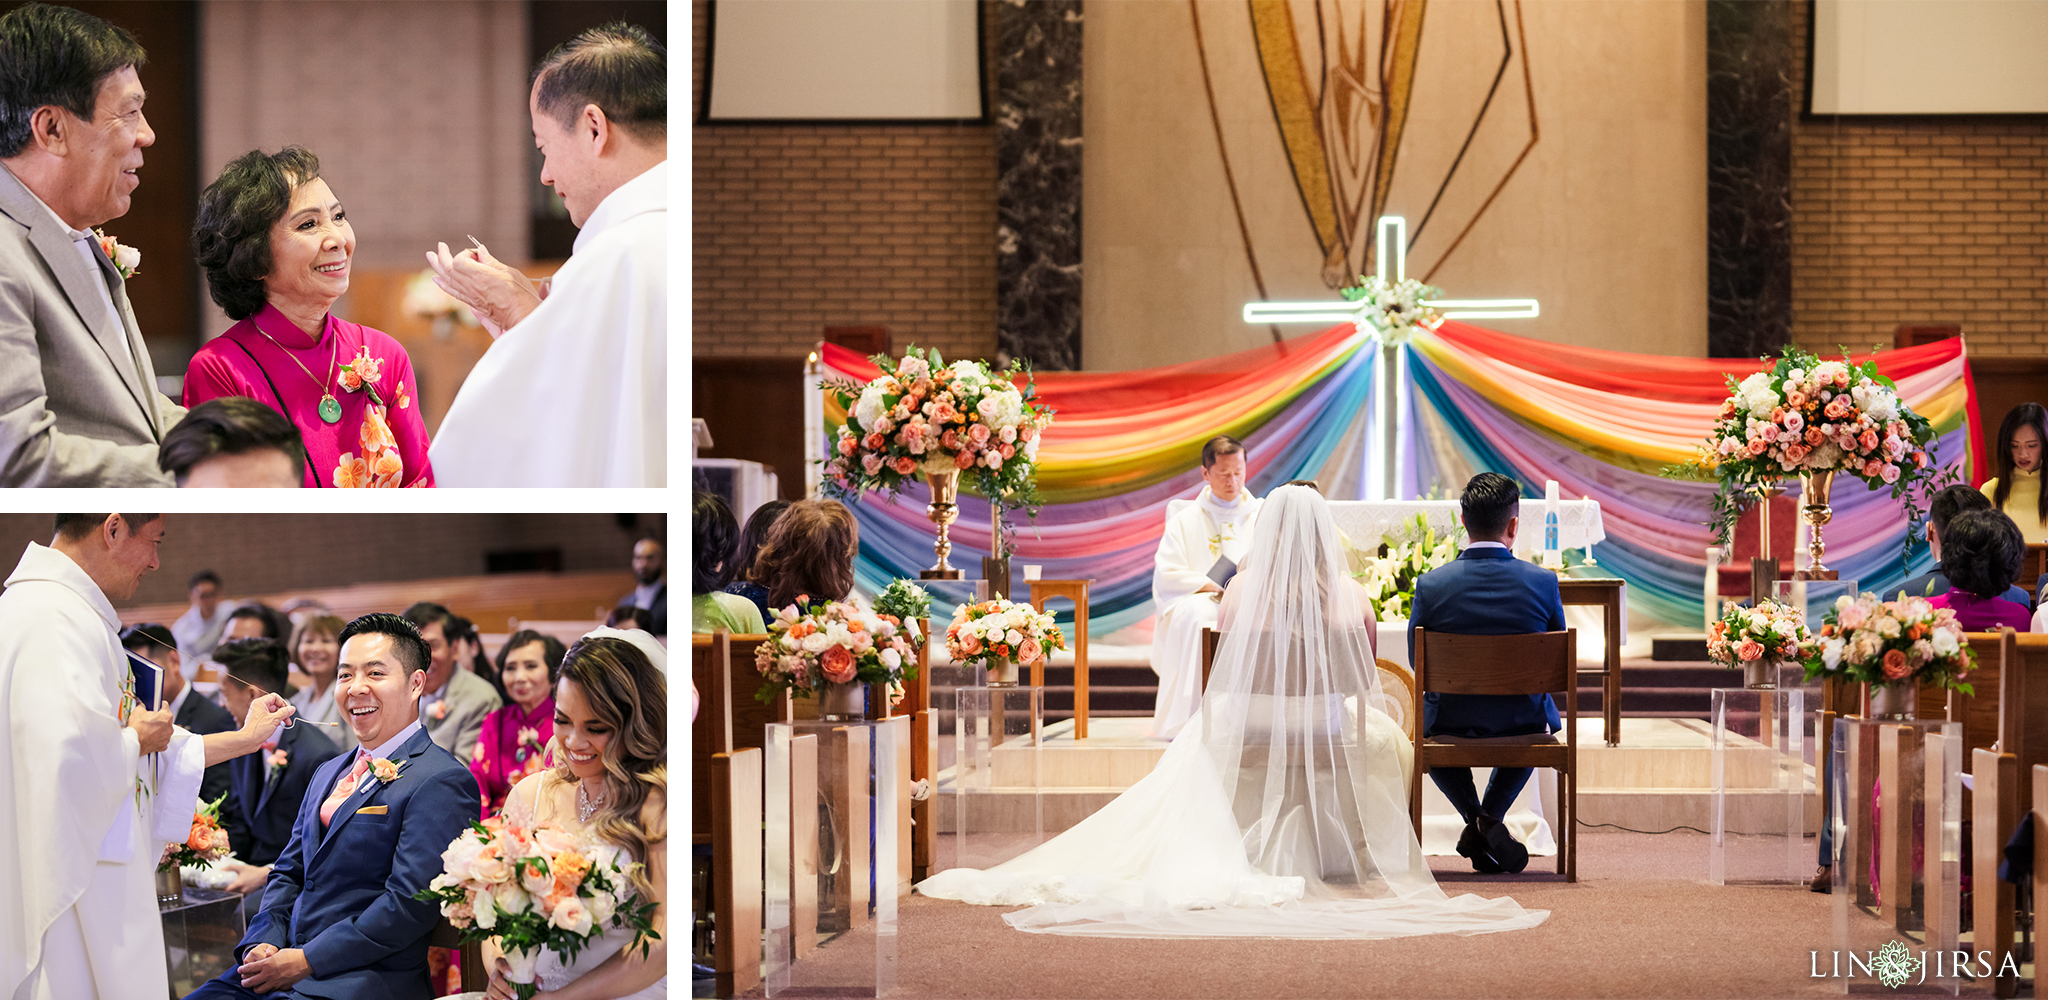 14 Hummingbird Nest Ranch Santa Susana Wedding Photography